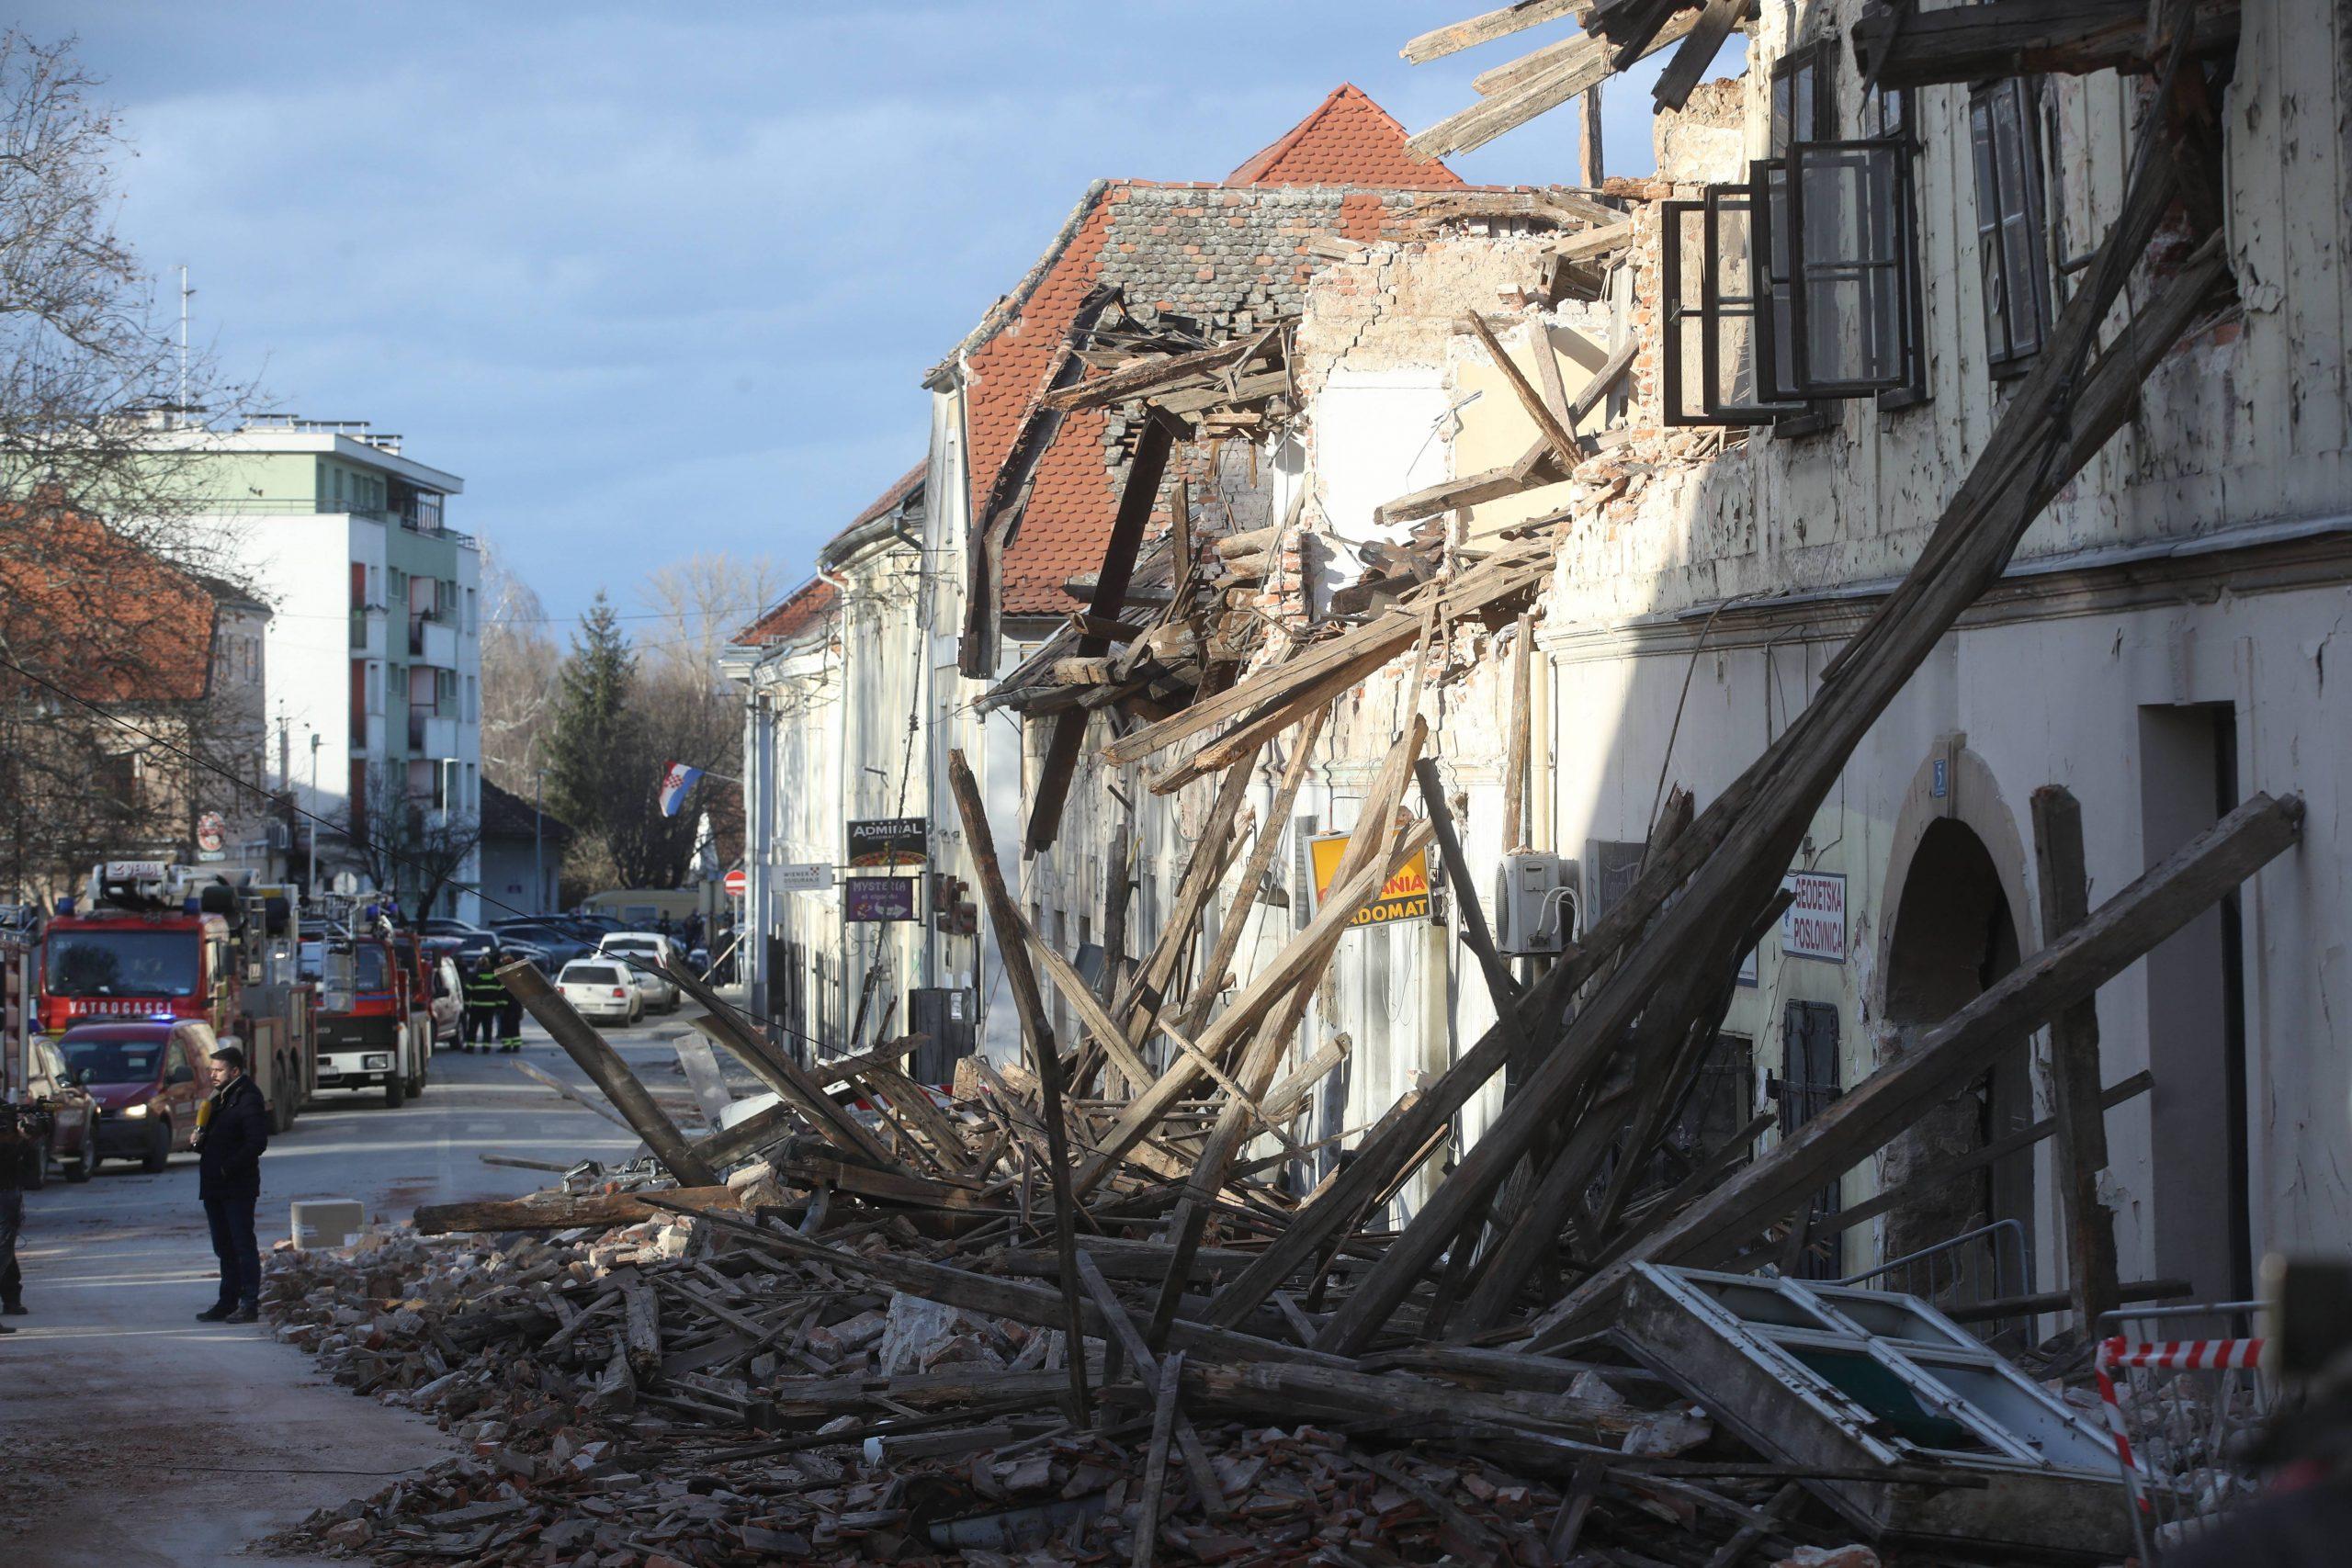 Rano jutros dva potresa kod Petrinje magnituda 3,7 i 3,3 1